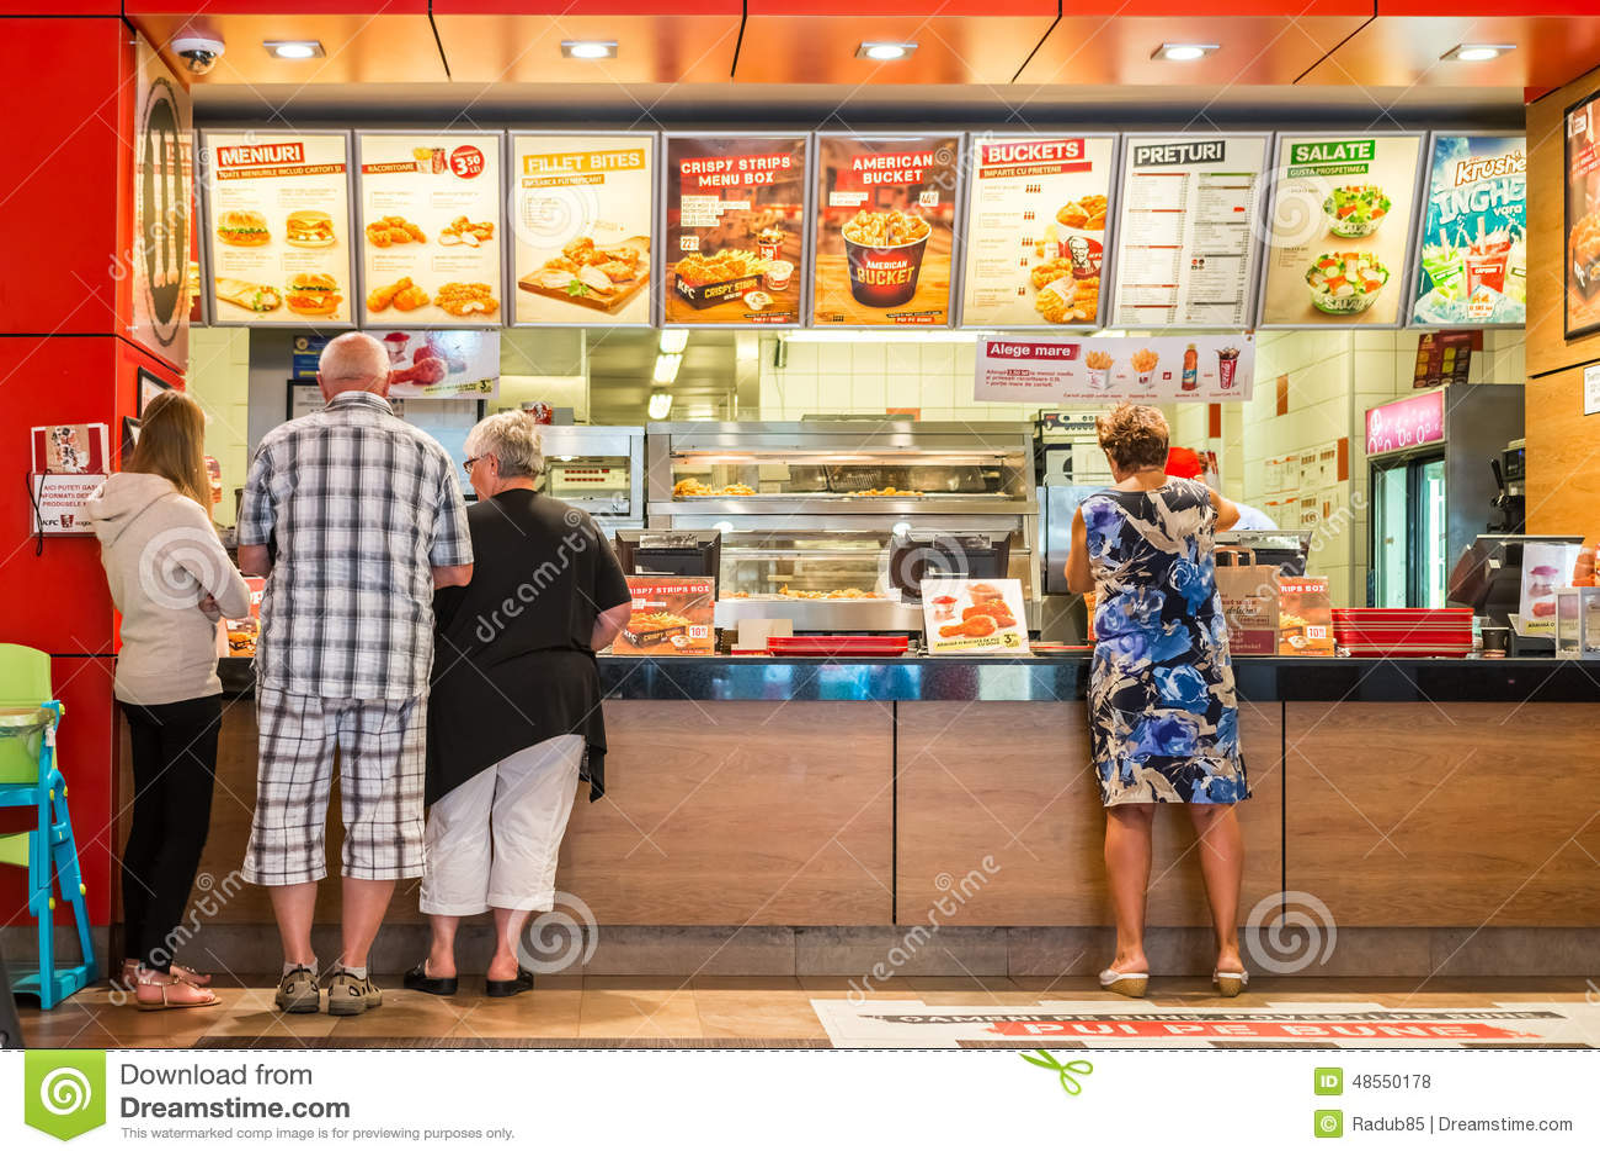 Fast Food Restaurants 93703